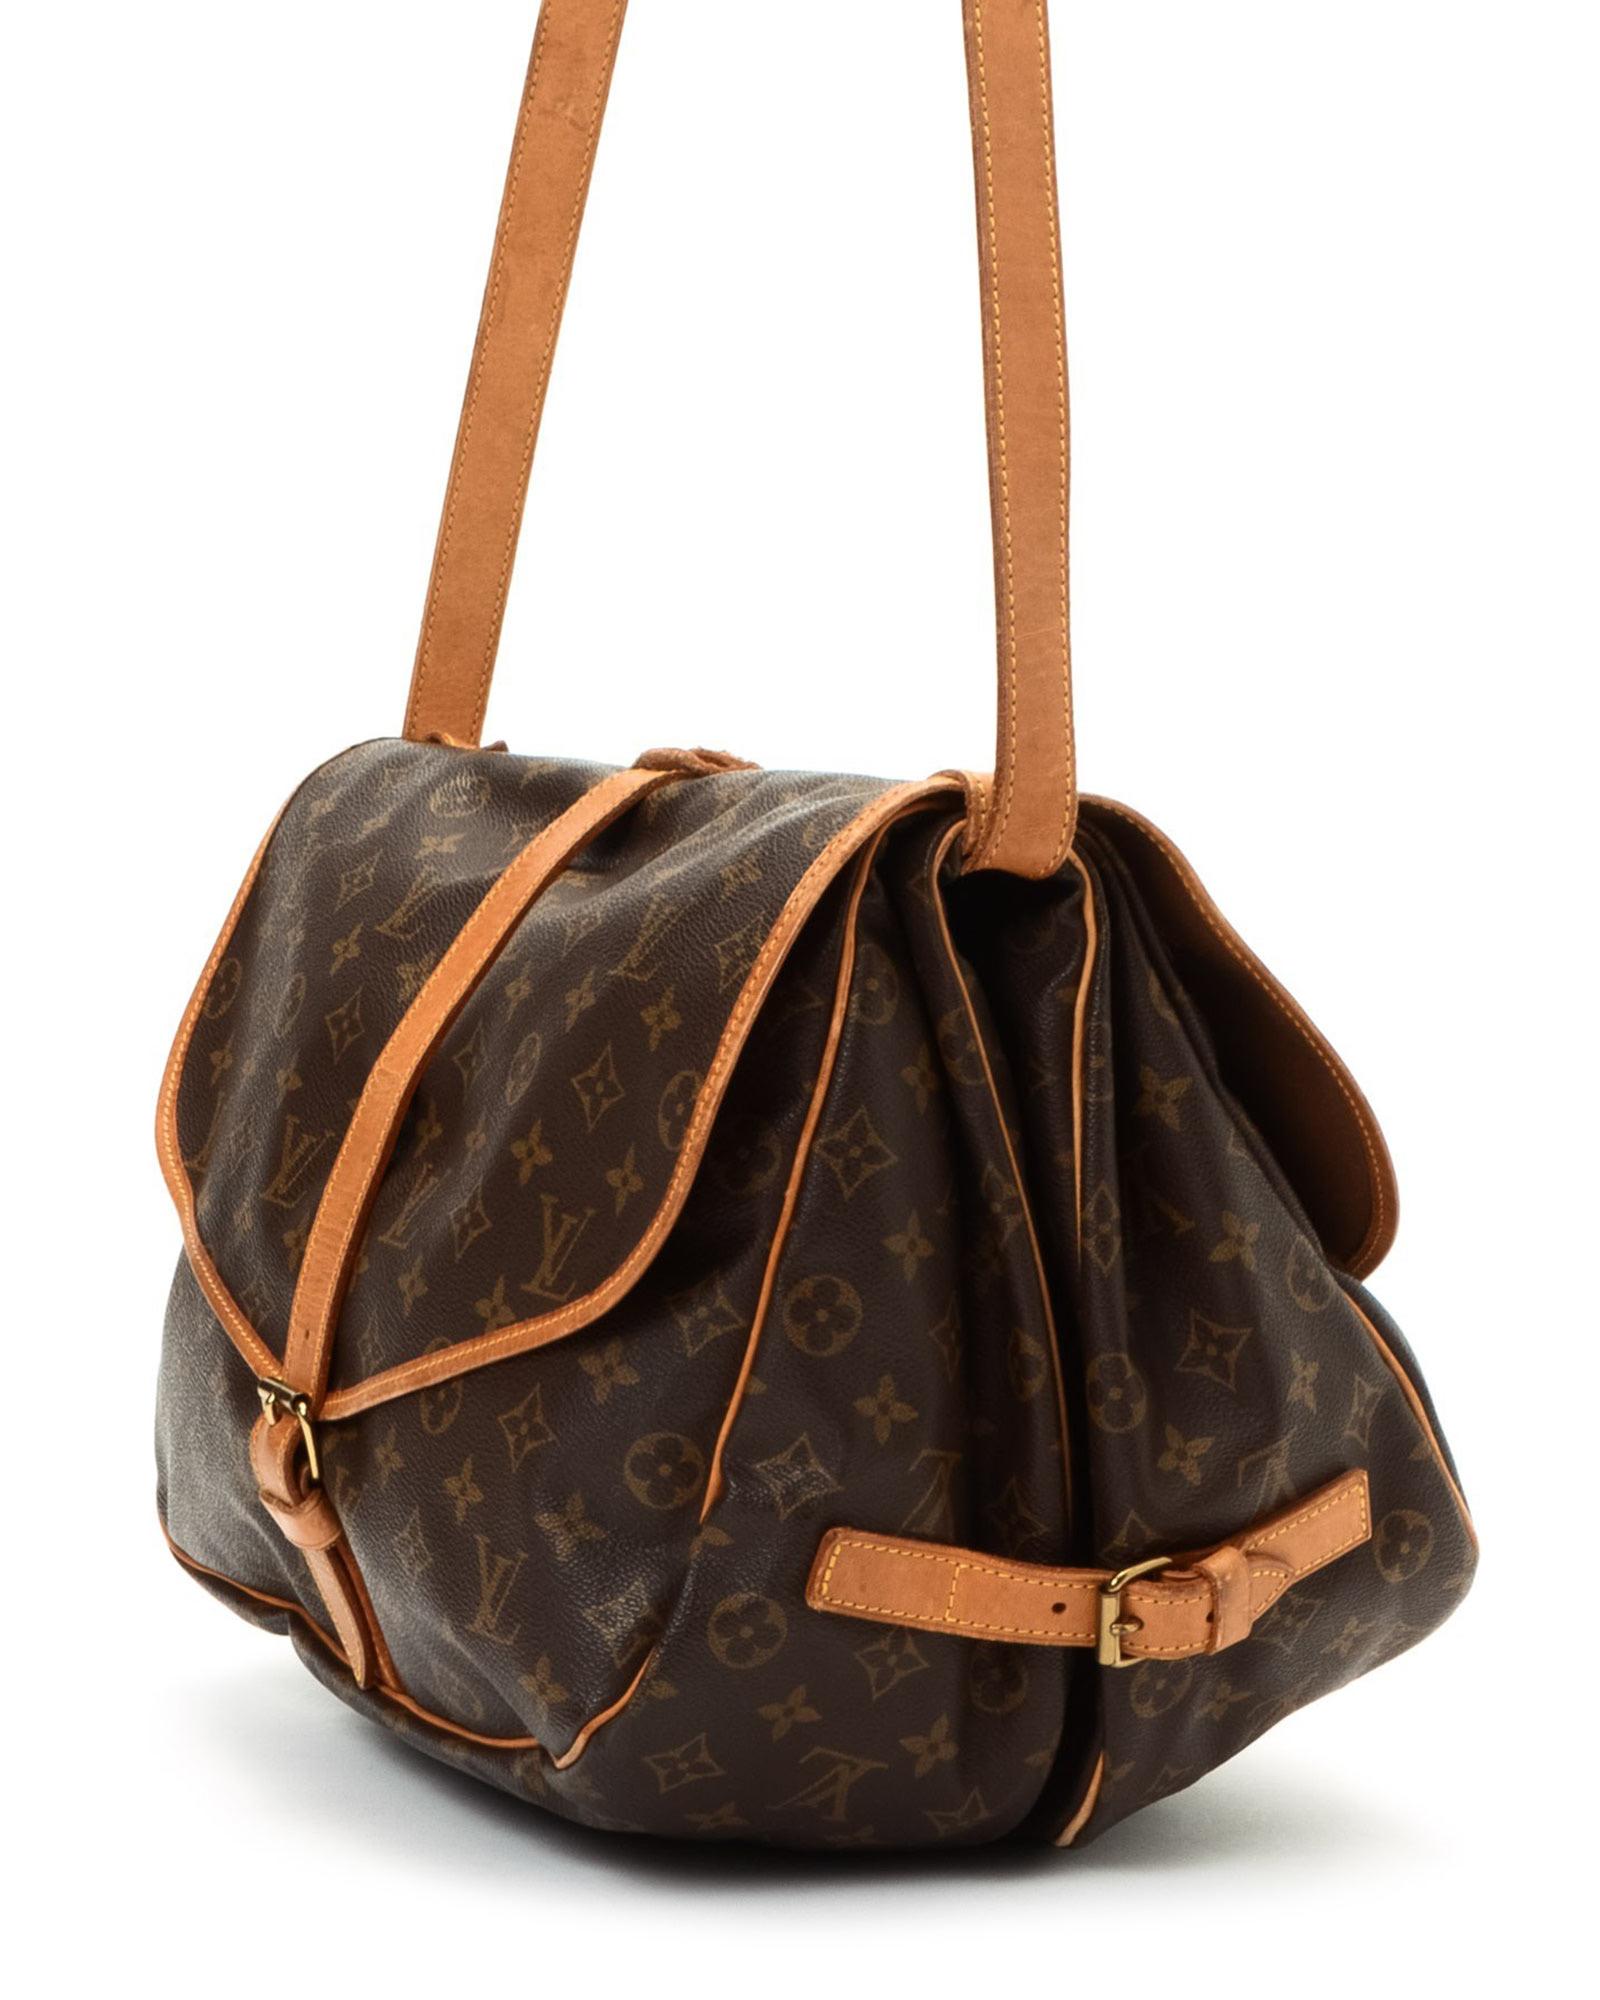 c37cff958093 Lyst - Louis Vuitton Messenger Bag - Vintage in Brown for Men